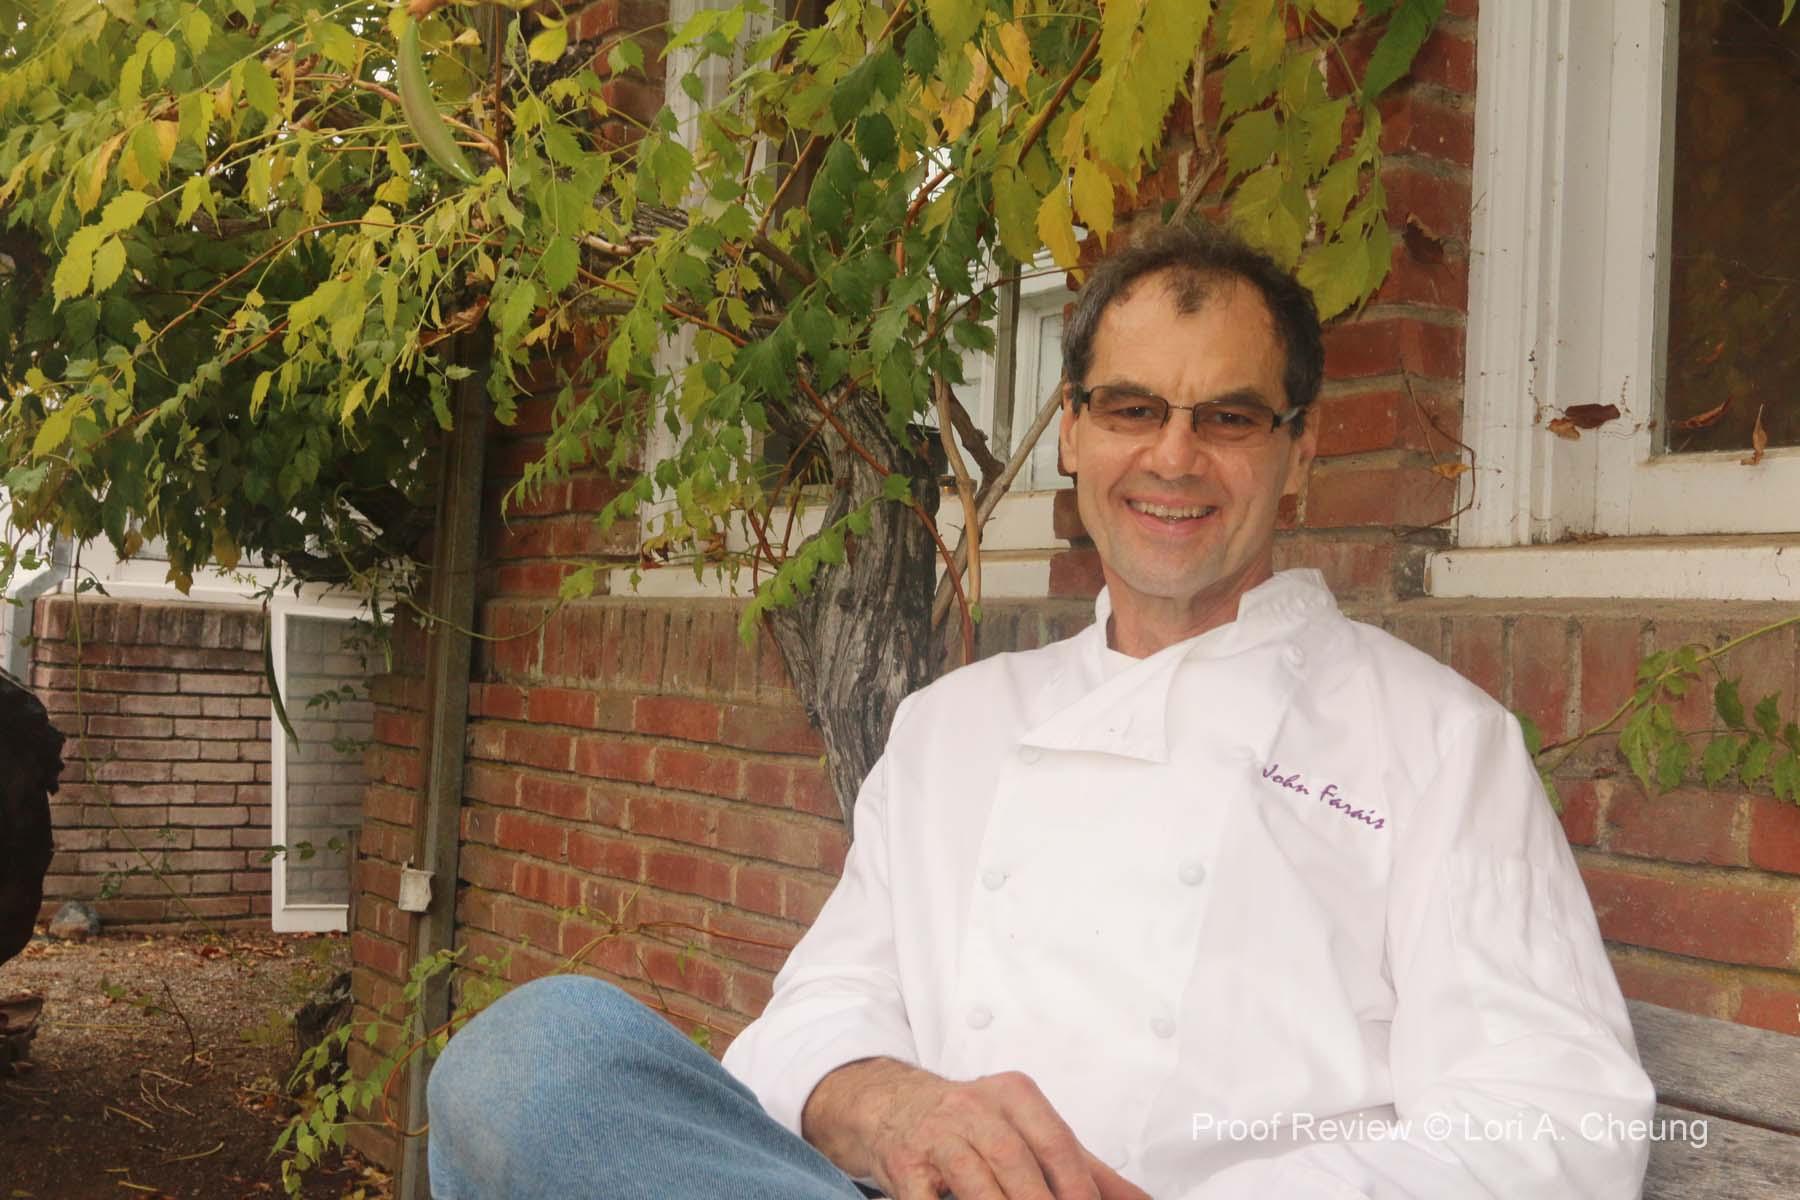 Chef John Farais,Marin County's Native Plant Specialist and Food Educator